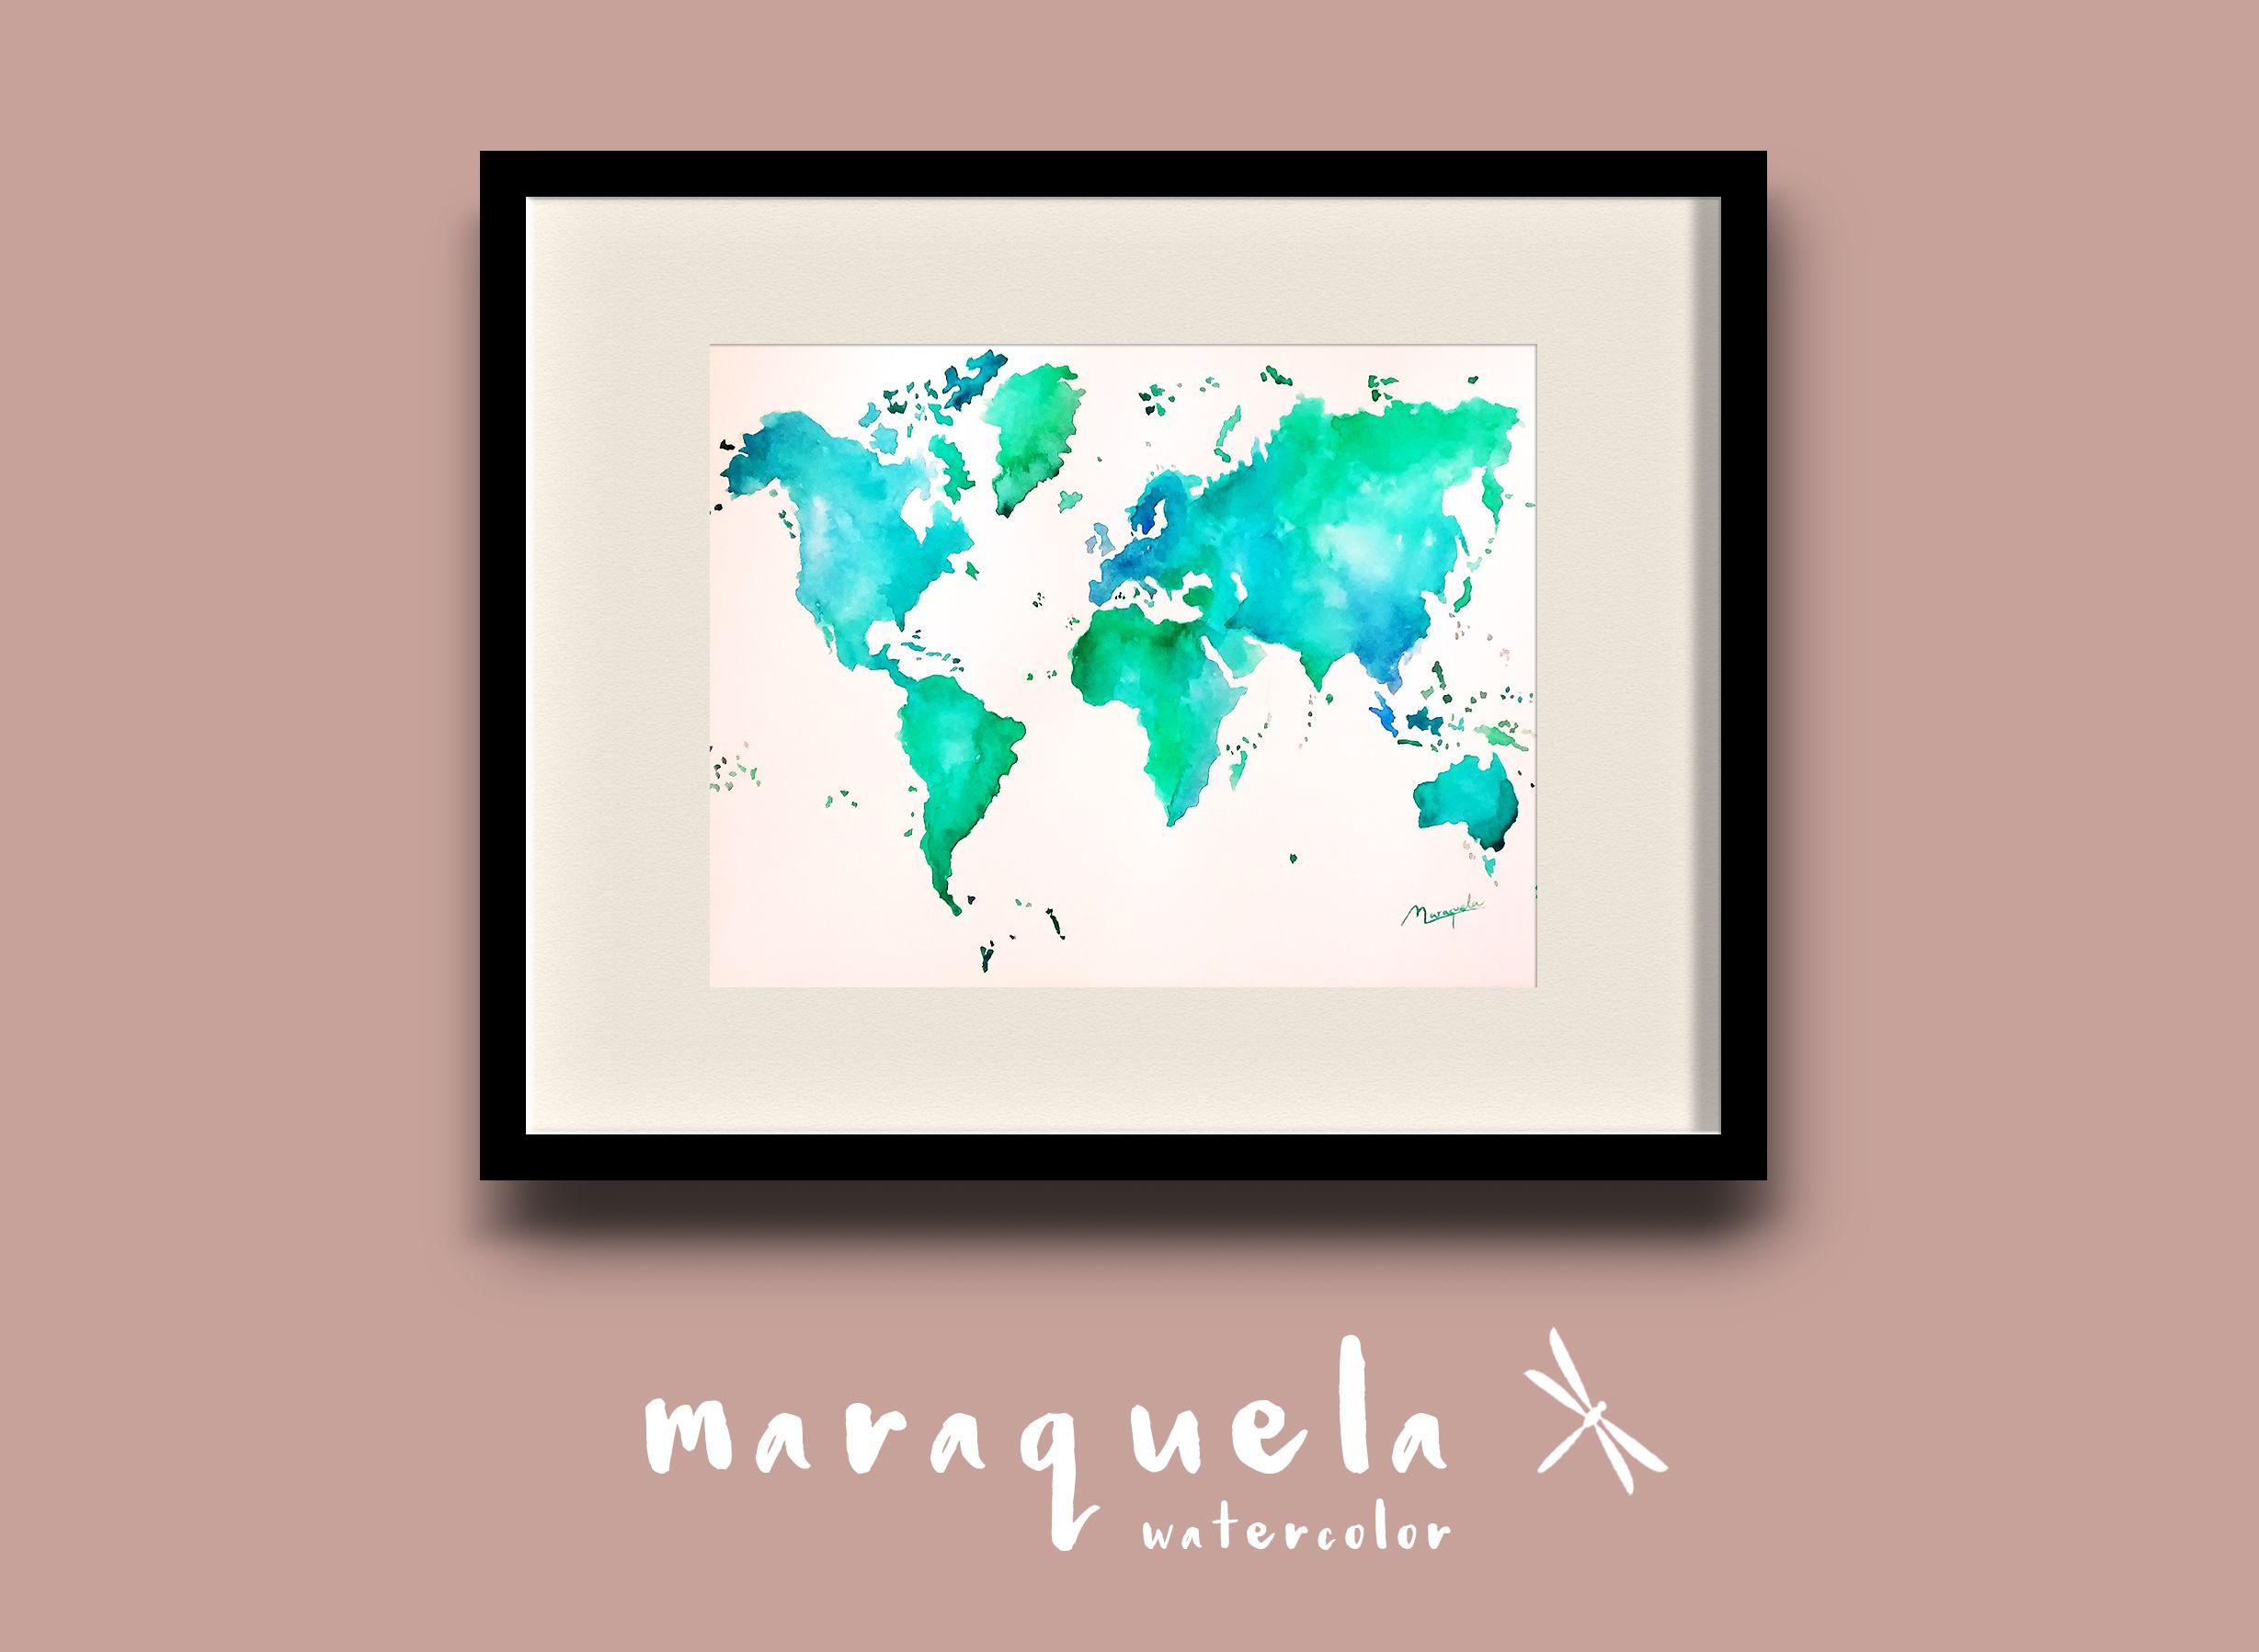 Watercolor World Map Mapa Mundi En Acuarela Colores Del Mar Unique Items Products Watercolor Original Watercolors